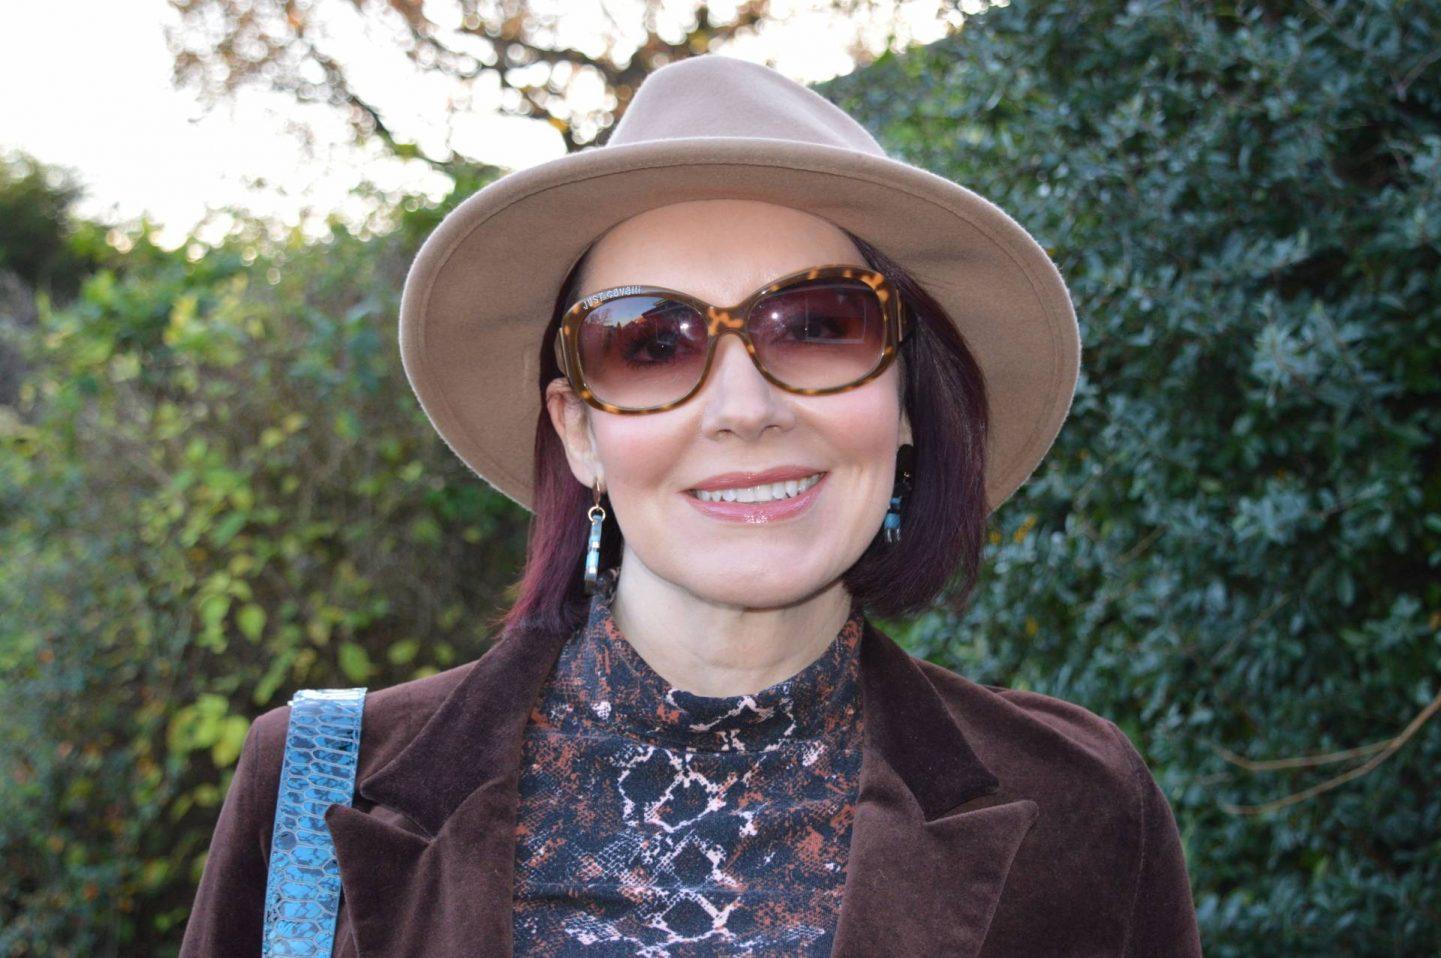 Zara camel fedora, Roberto Cavalli brown sunglasses